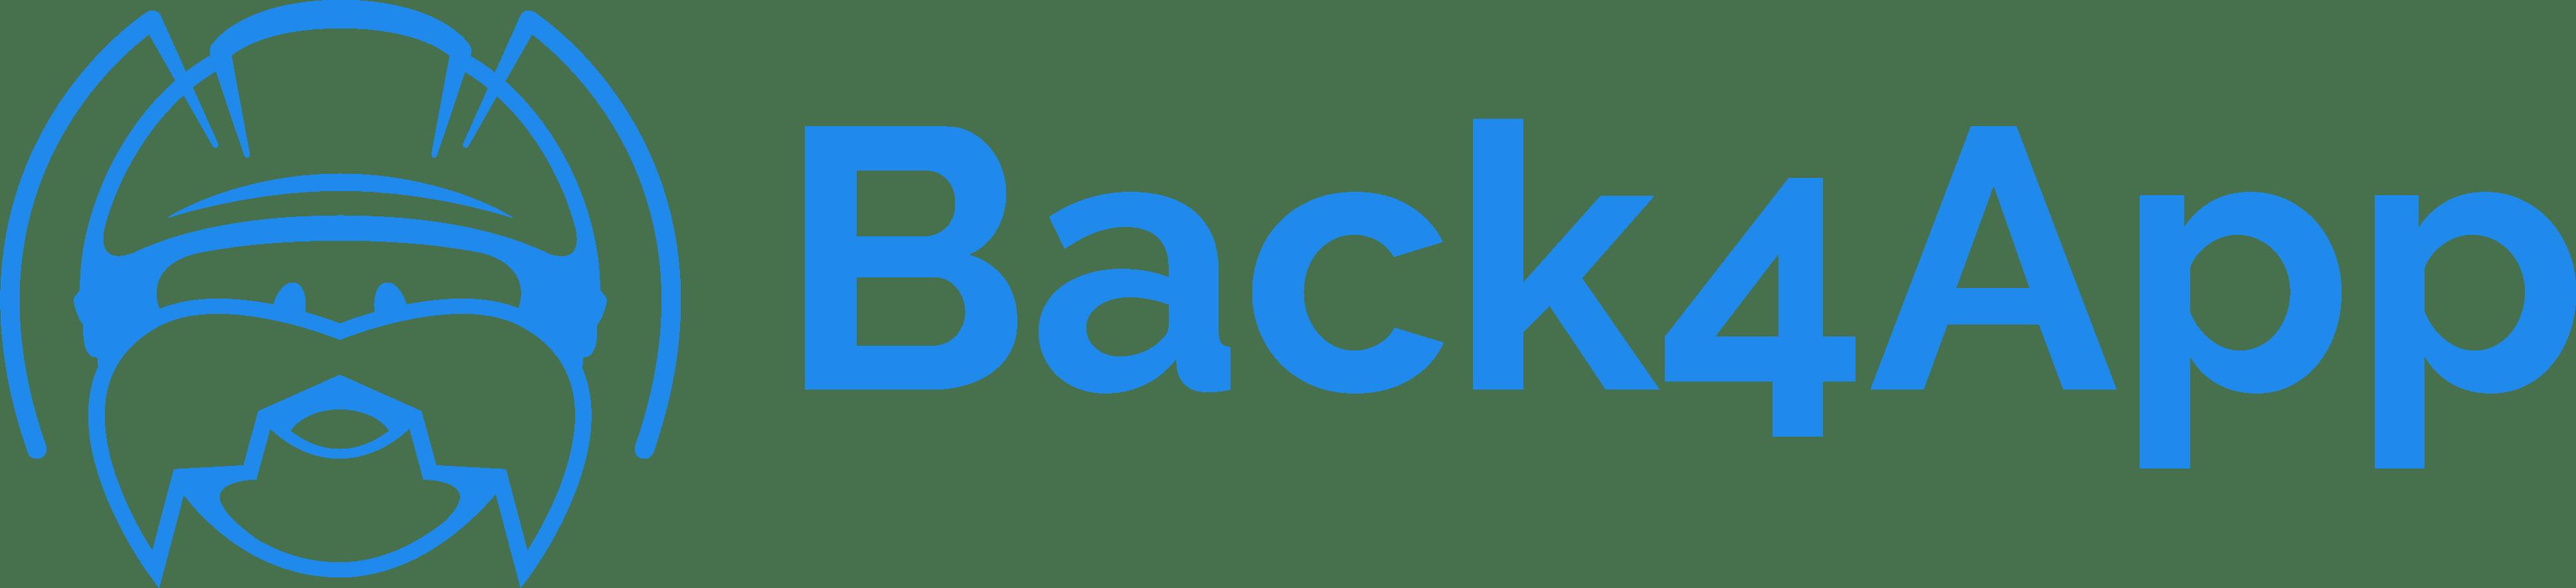 back4app-logo-blue-high